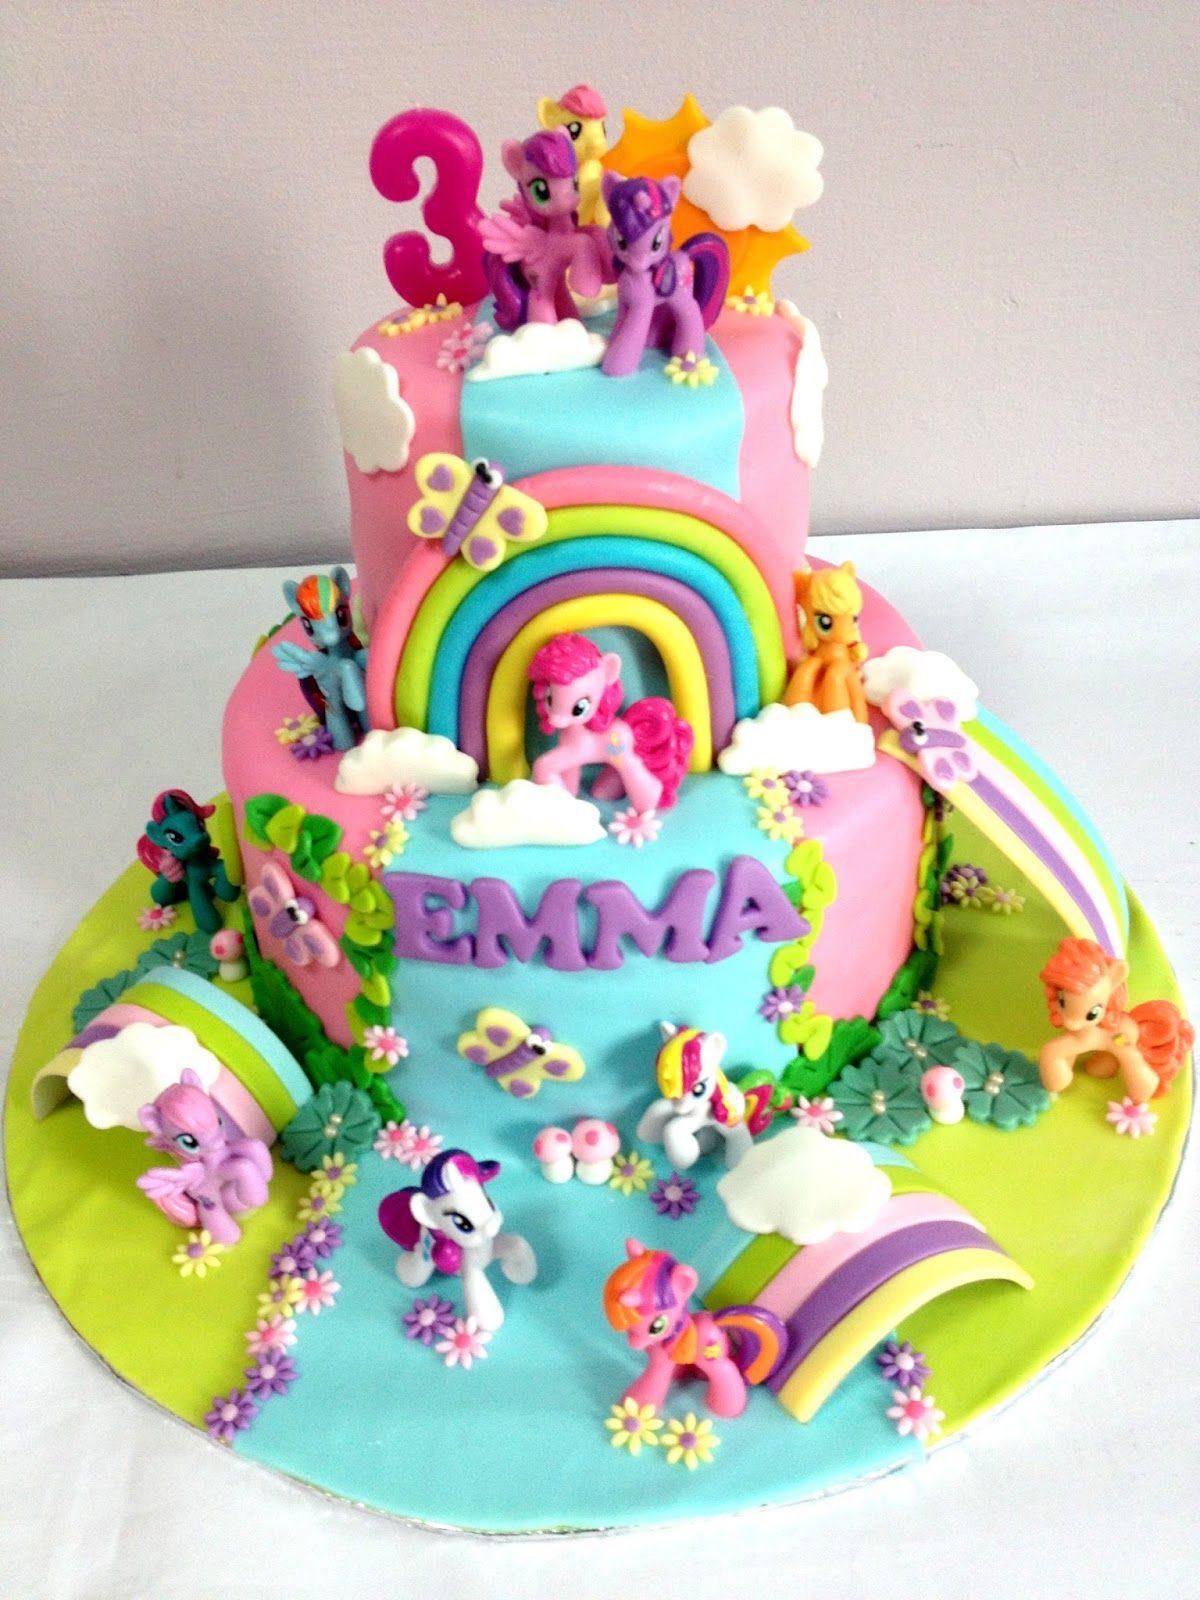 Happy Birthday Emma Cake Toys Provided By Customer